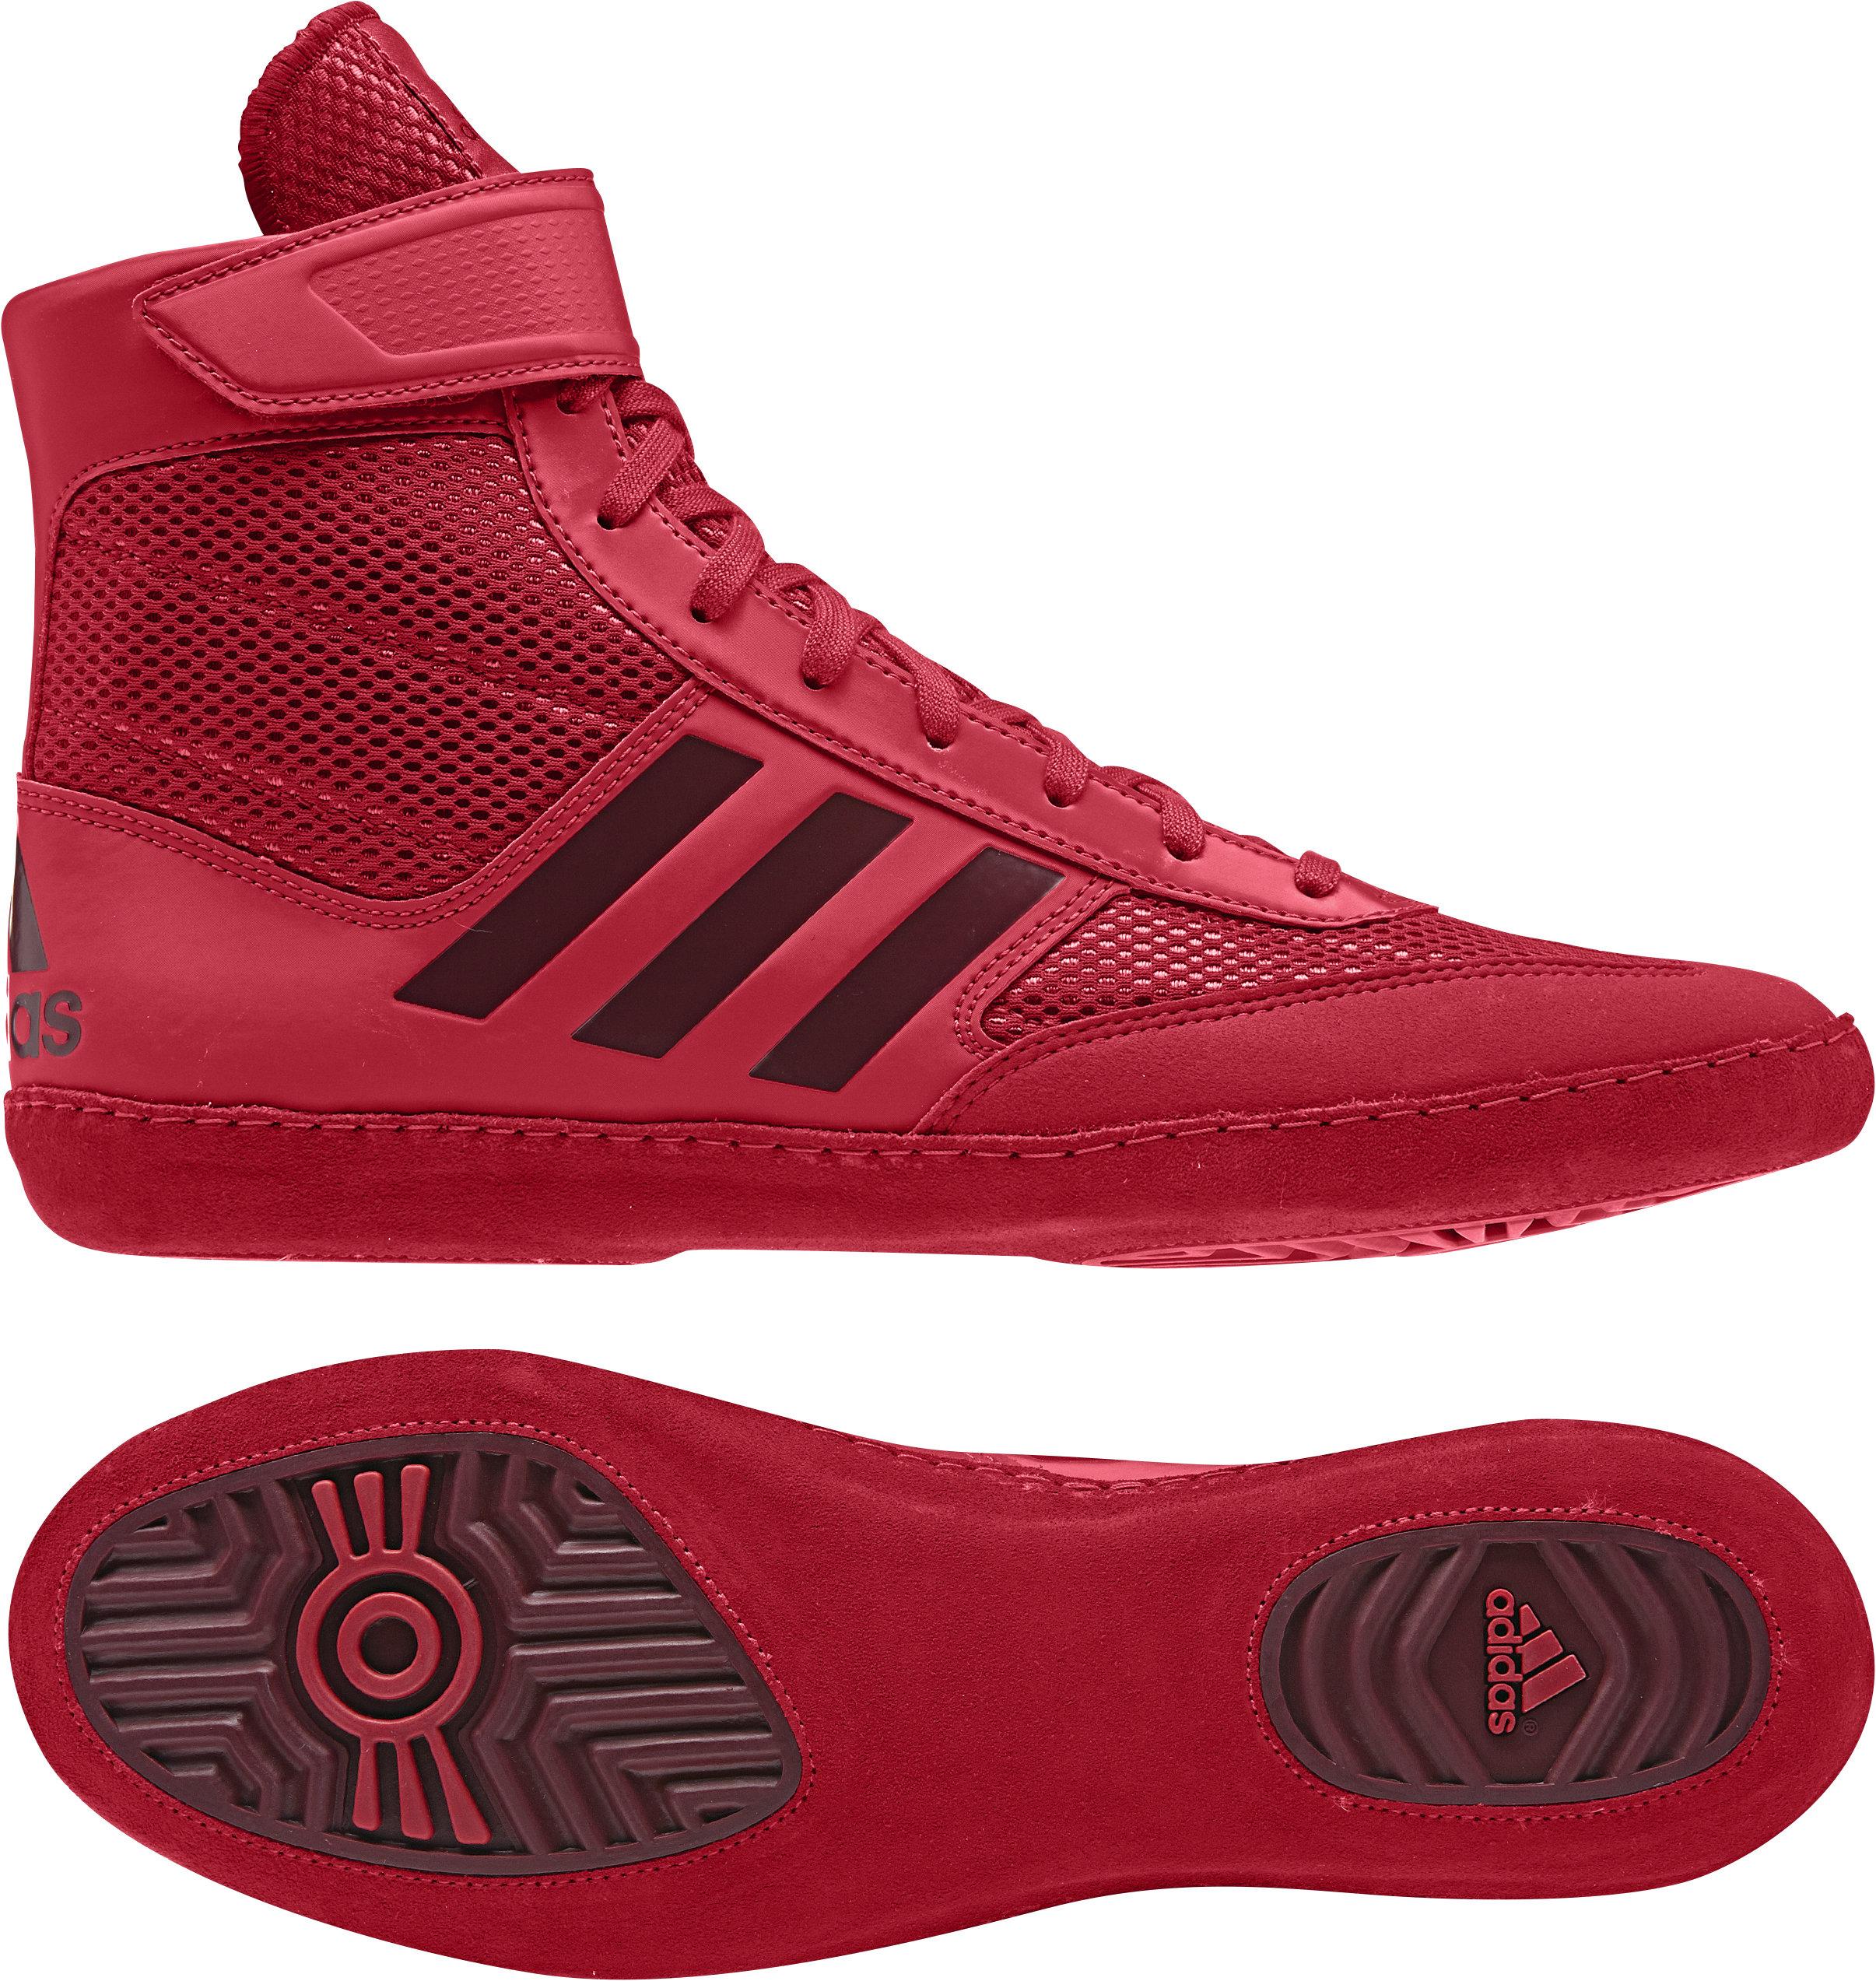 RED/DARK RED